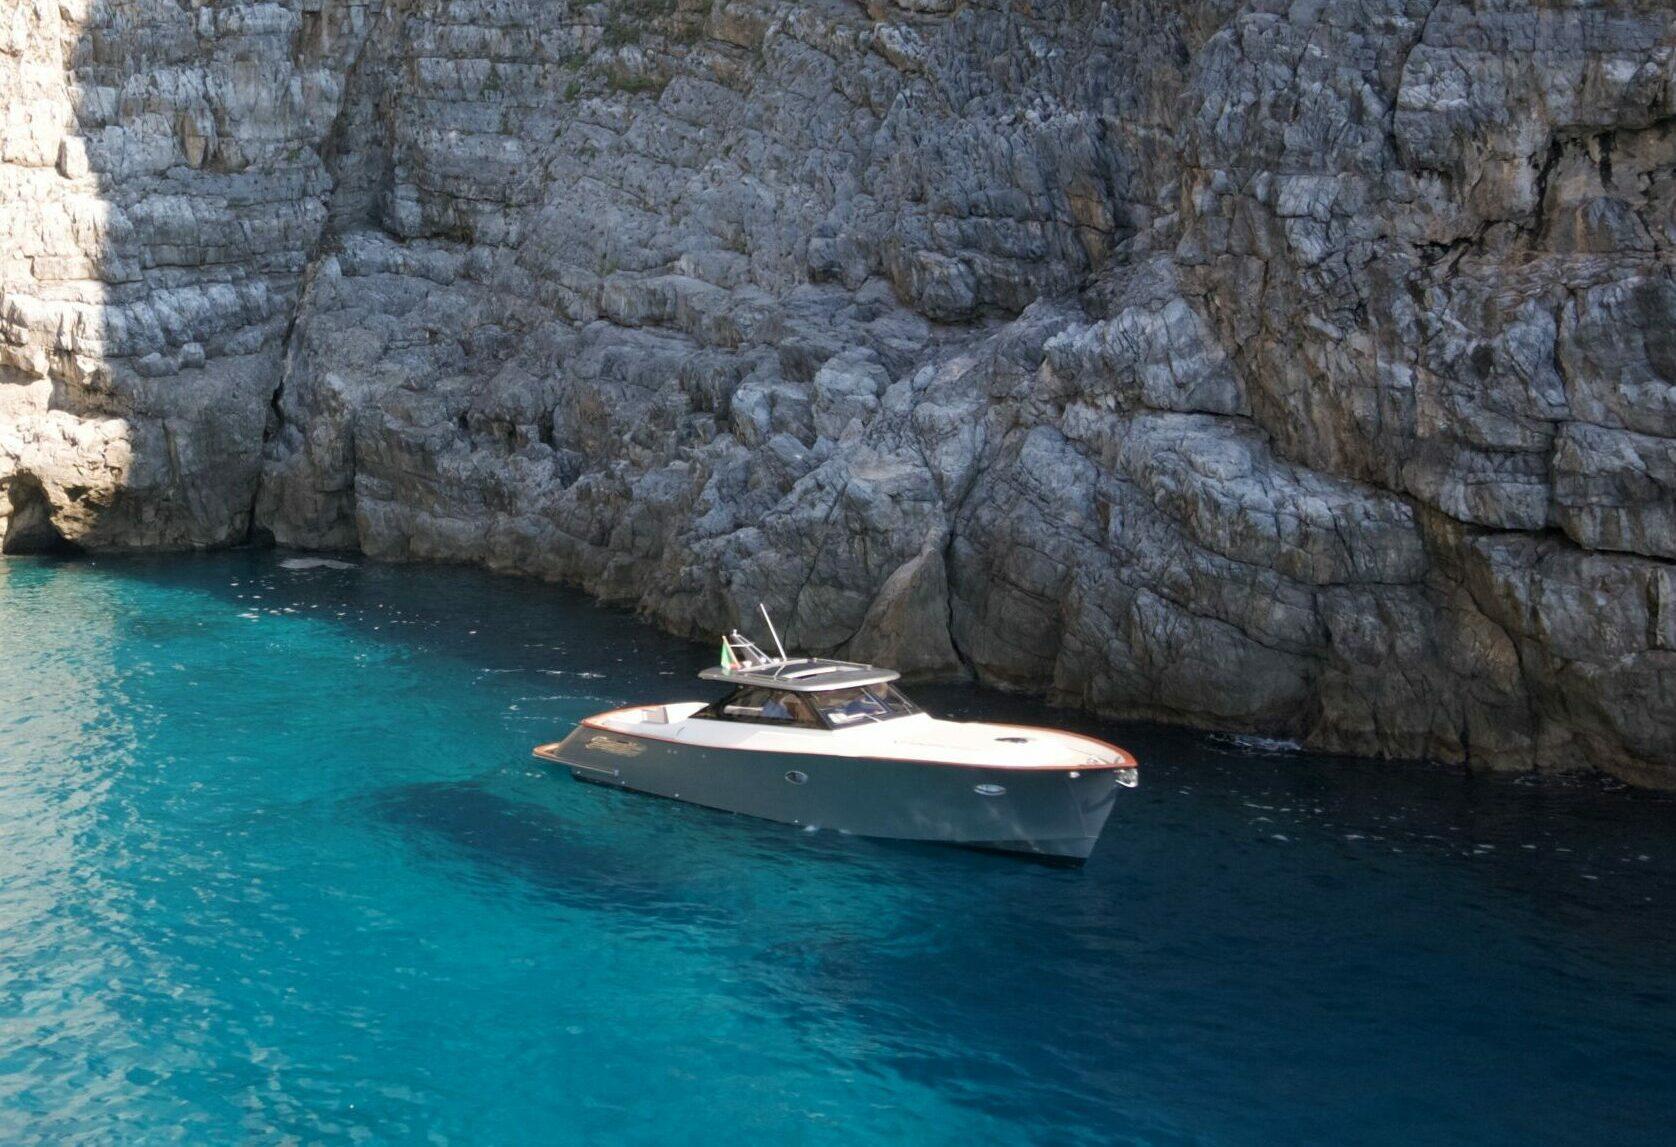 Our Newcomer: Gagliotta EN - Sieckmann Yachts